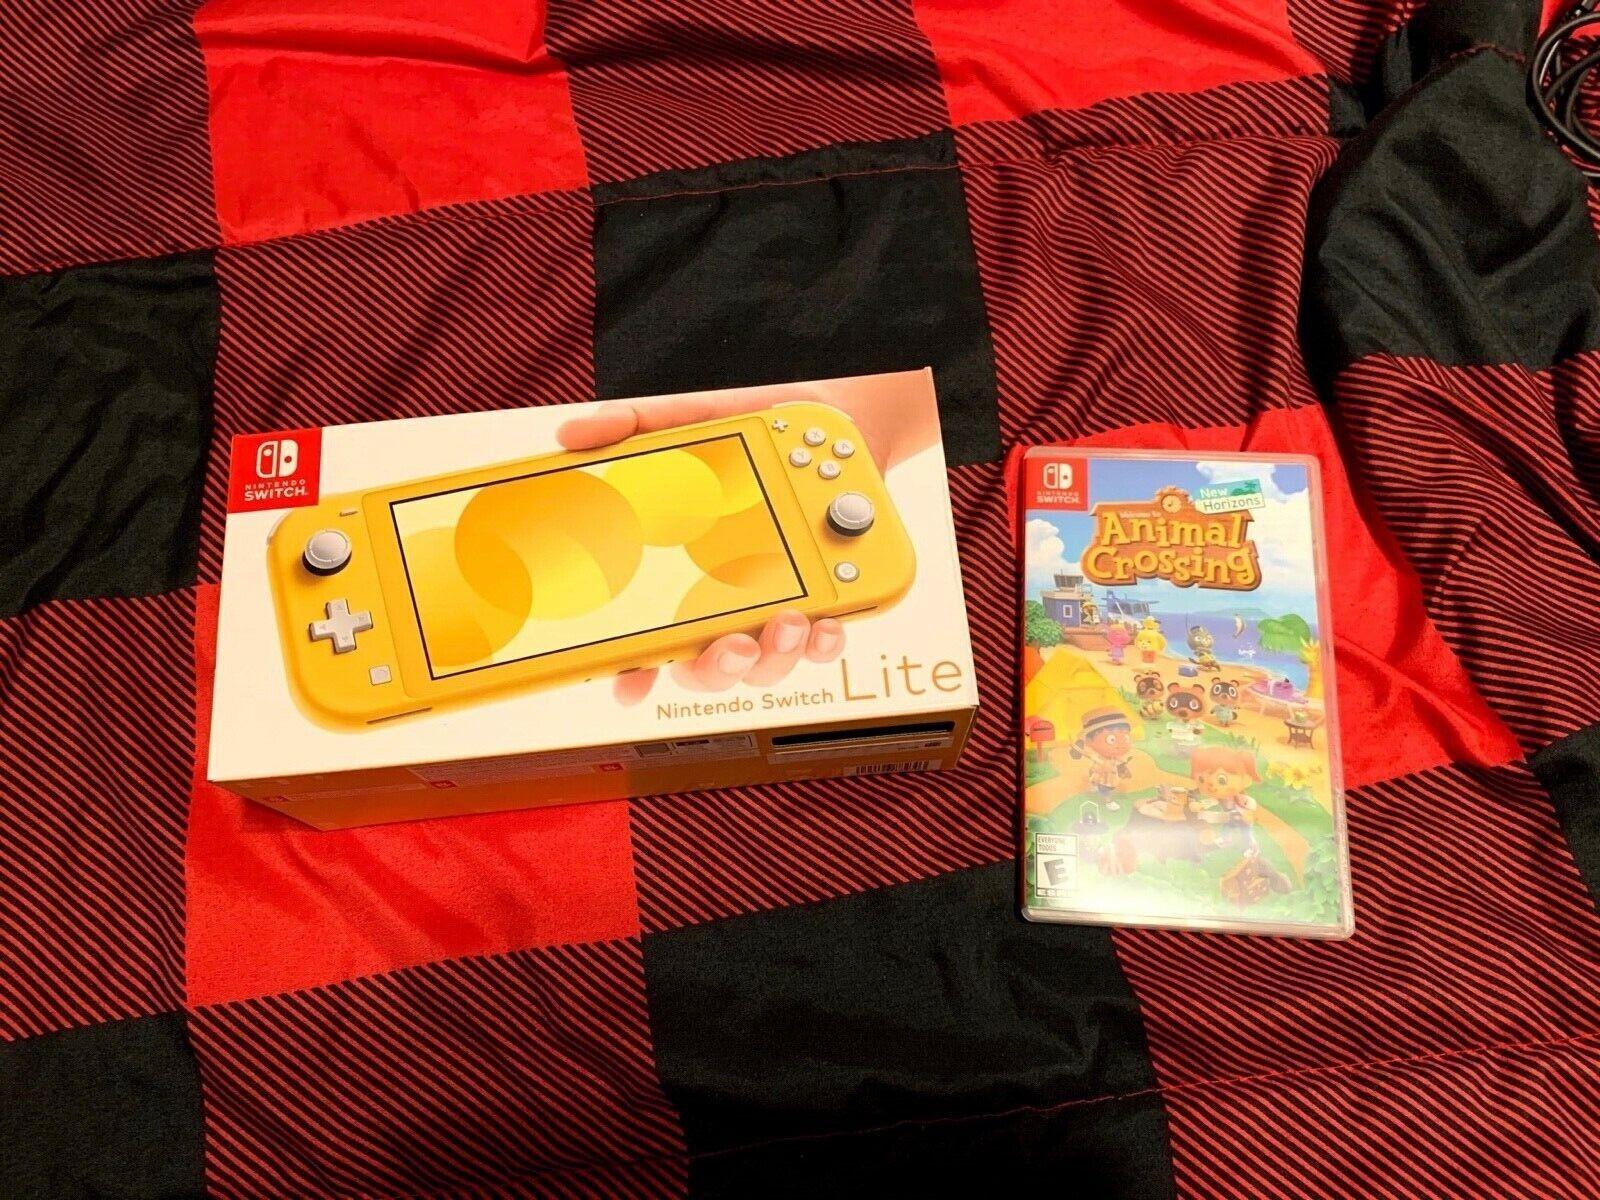 Nintendo Switch Lite Console - Yellow Animal Crossing New Horizons - $240.00